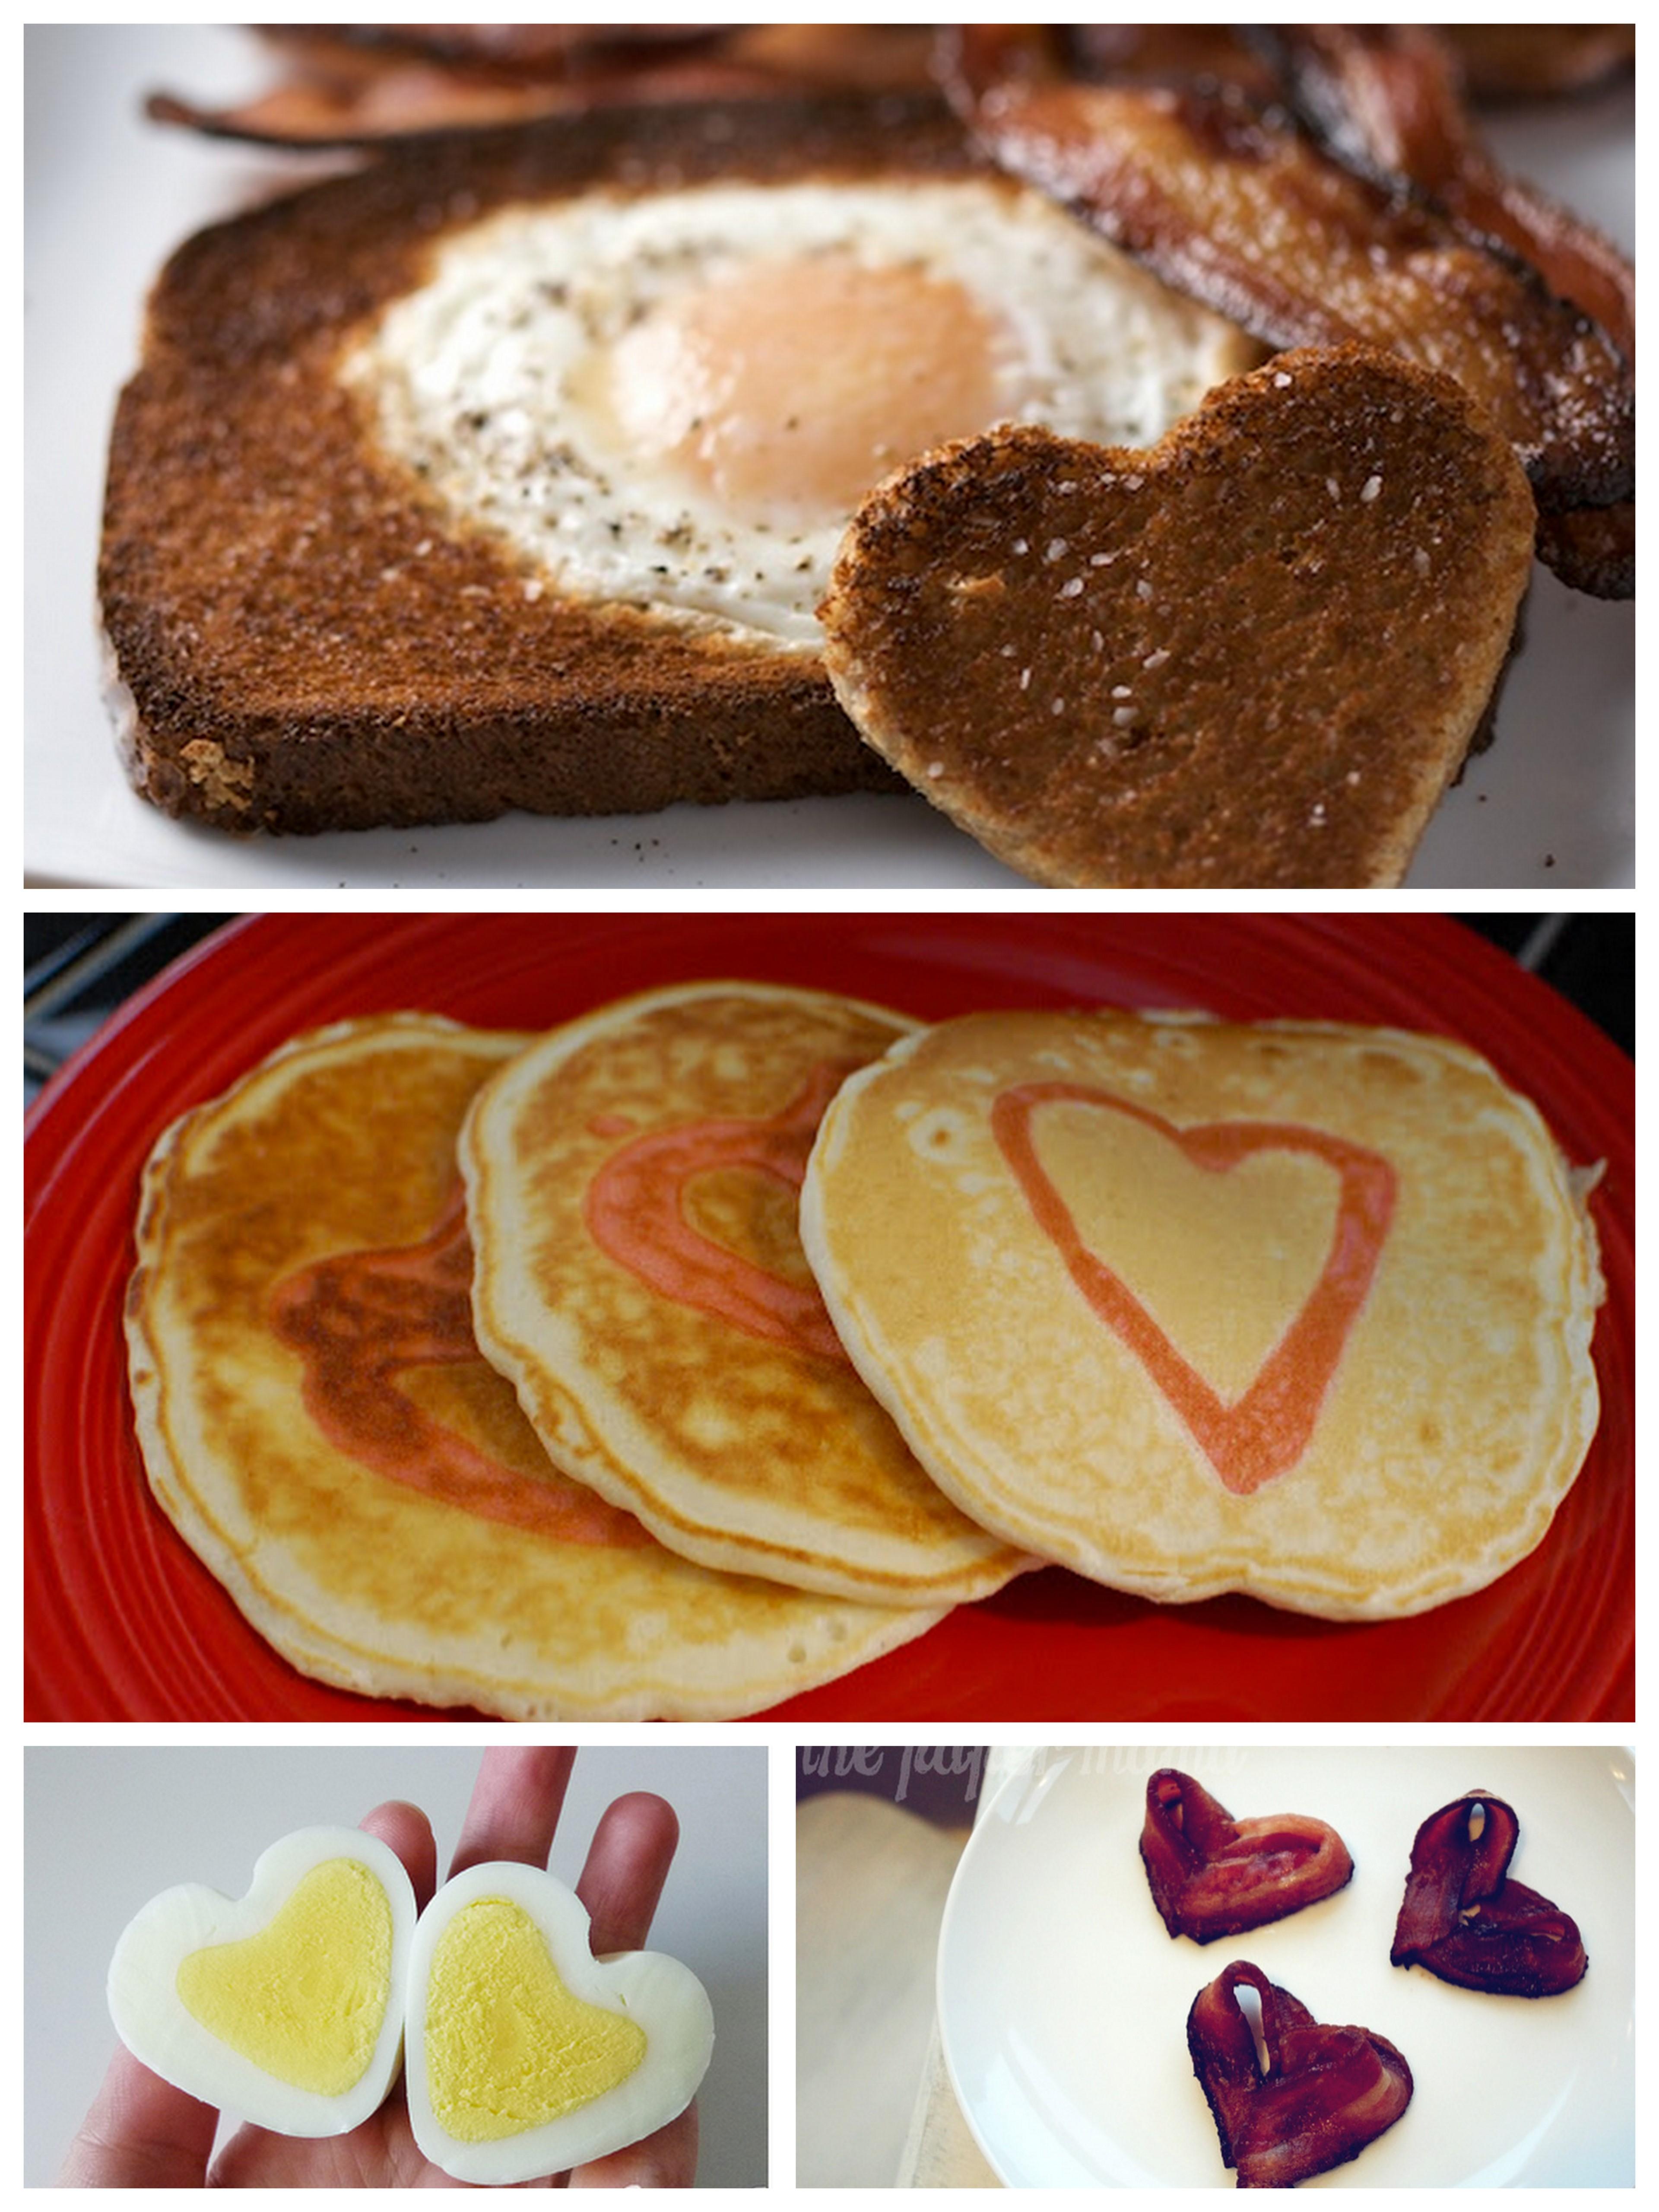 Valentineu0027s Breakfast Ideas: